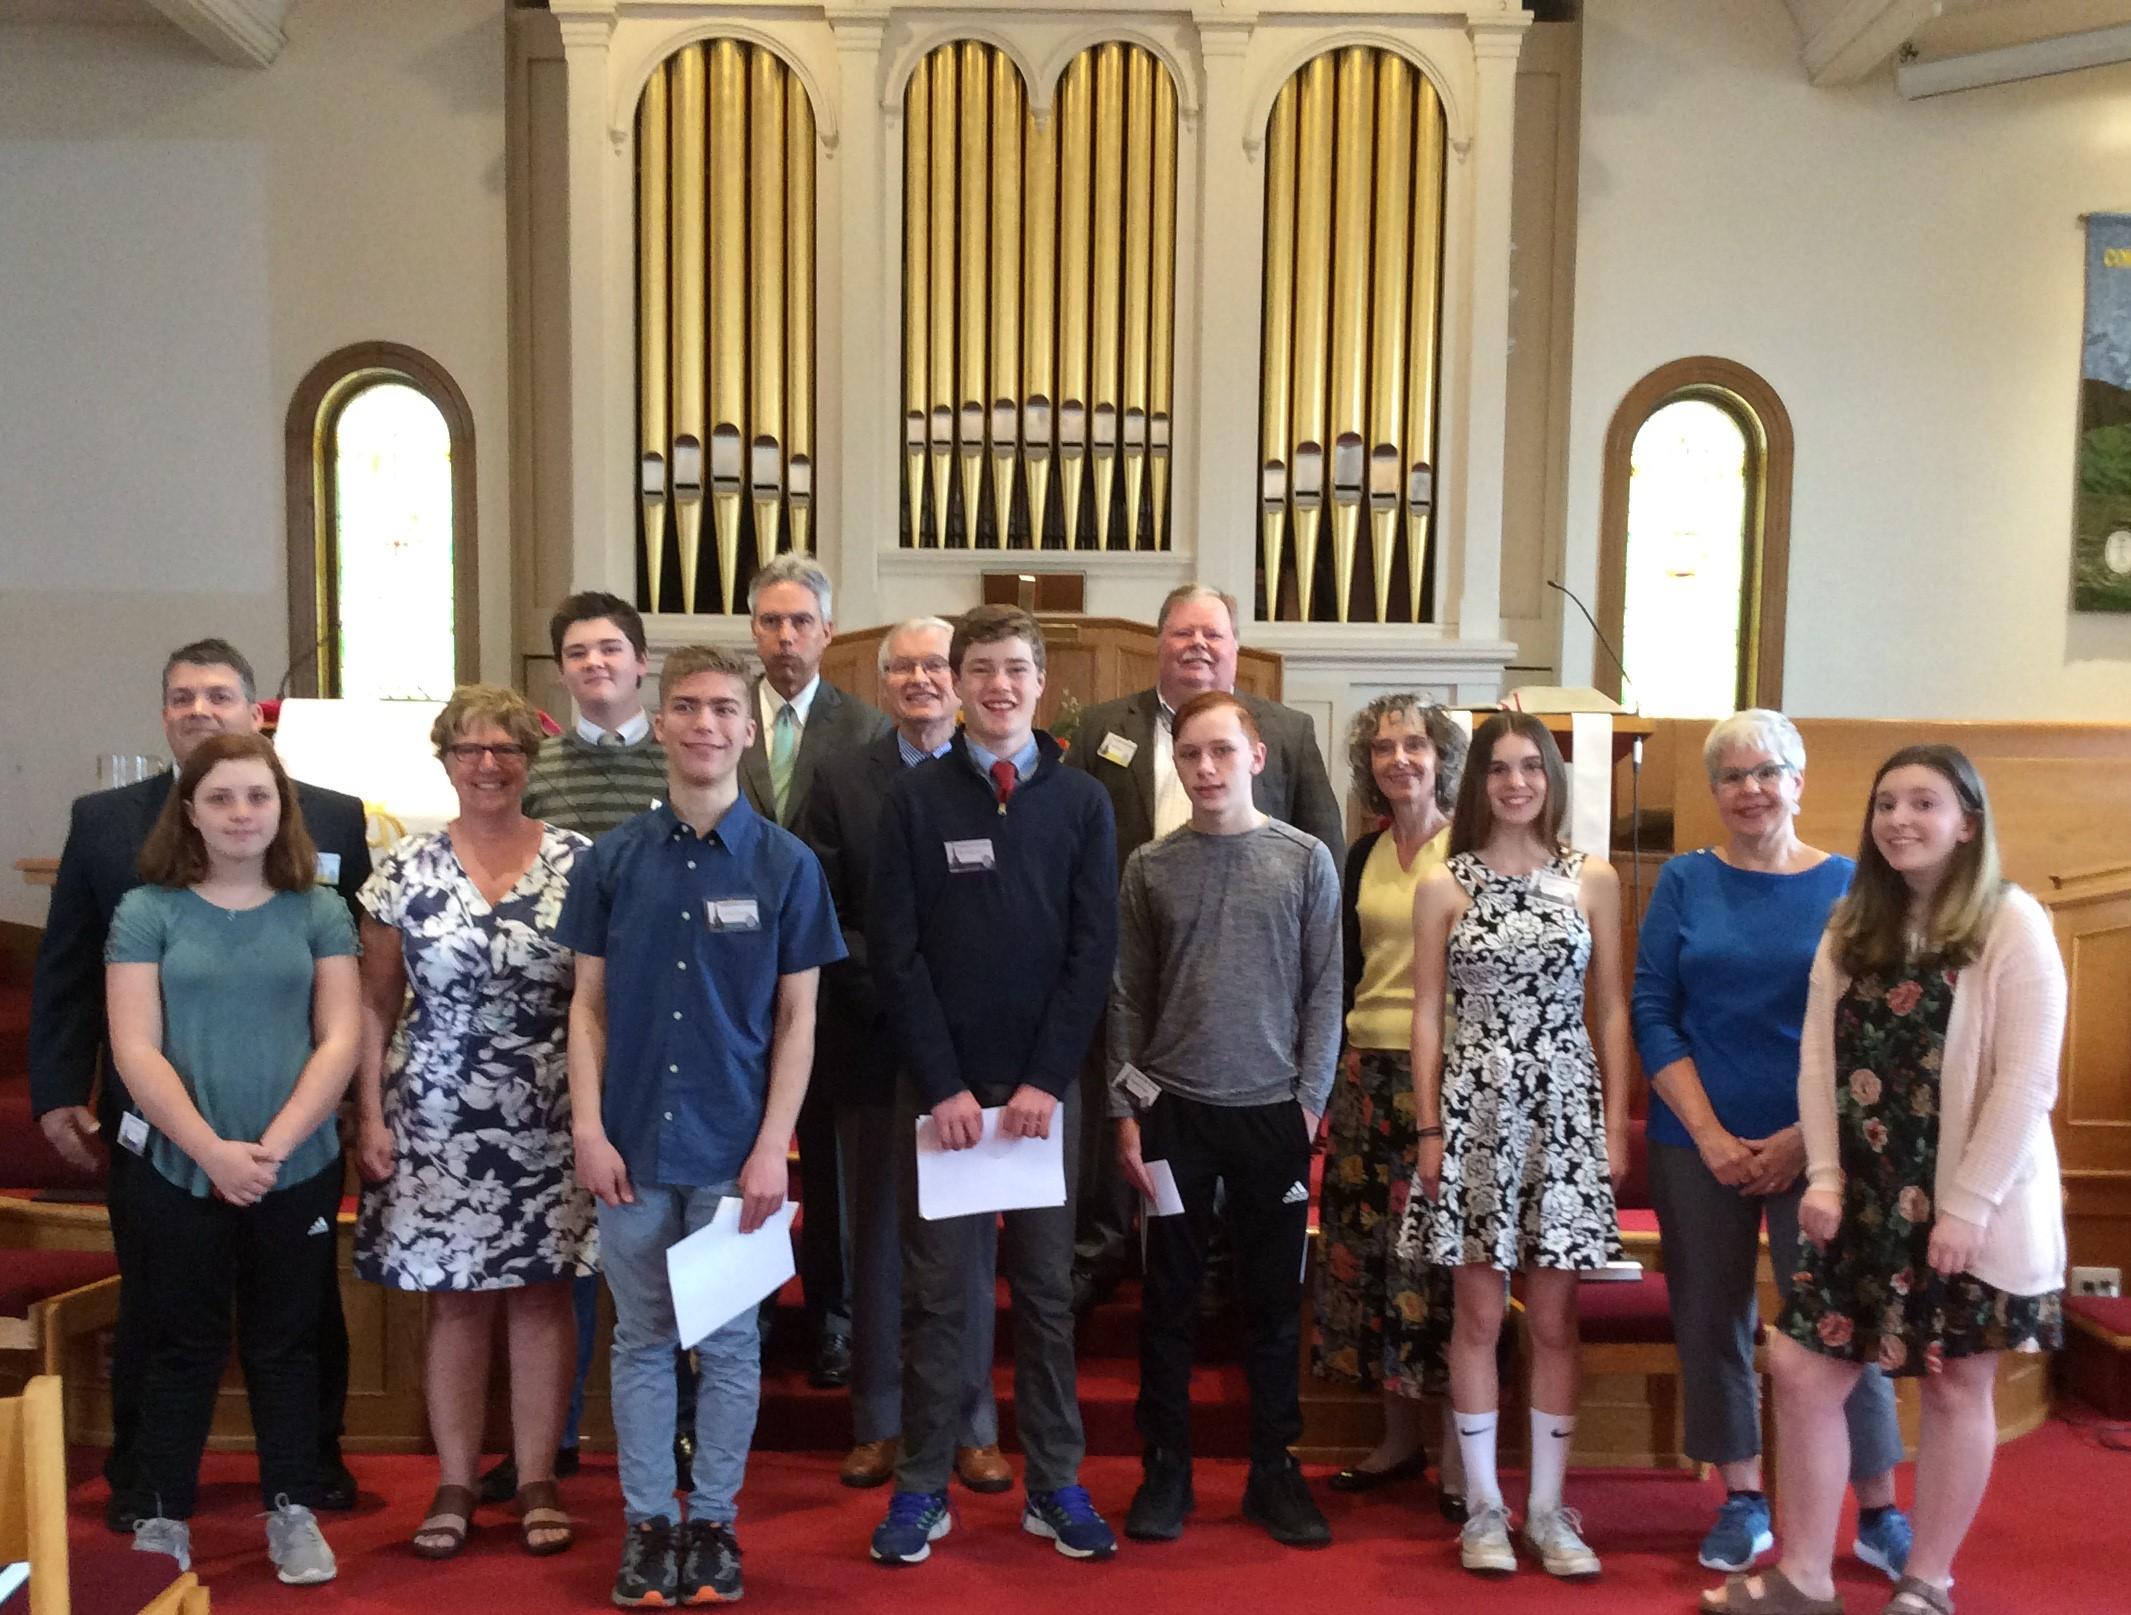 confirmation group 2018 sanctuary.JPG